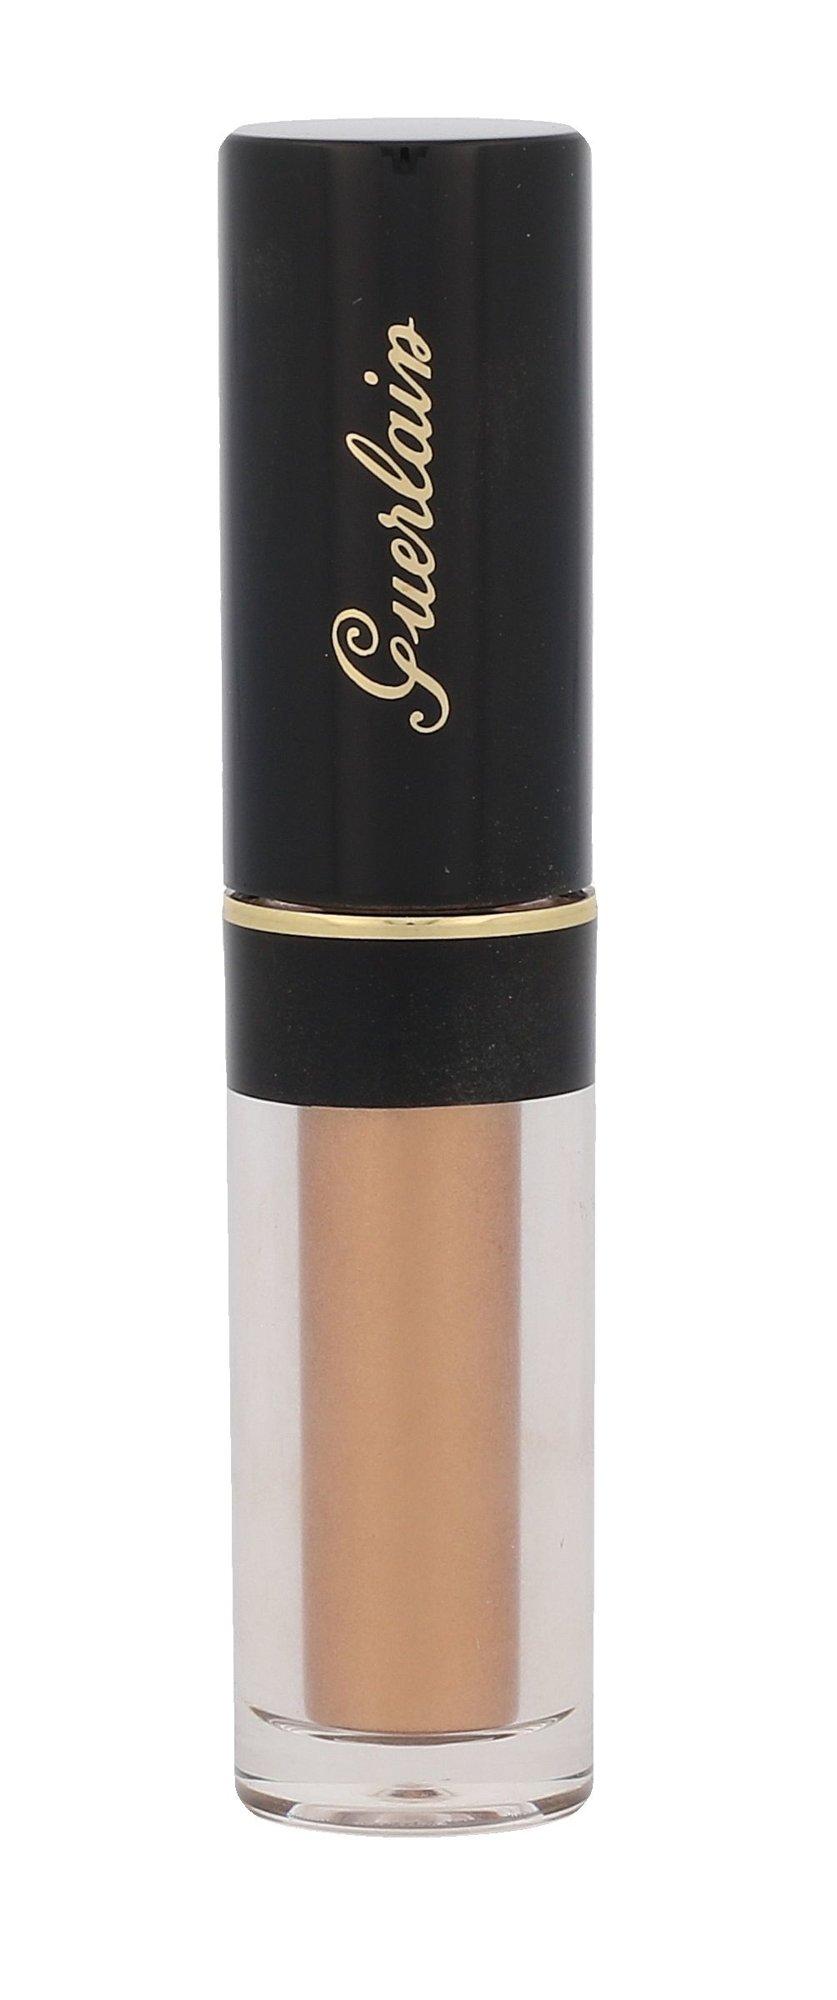 Guerlain Fard Metal Cosmetic 0,7ml 01 Cuivre Ora